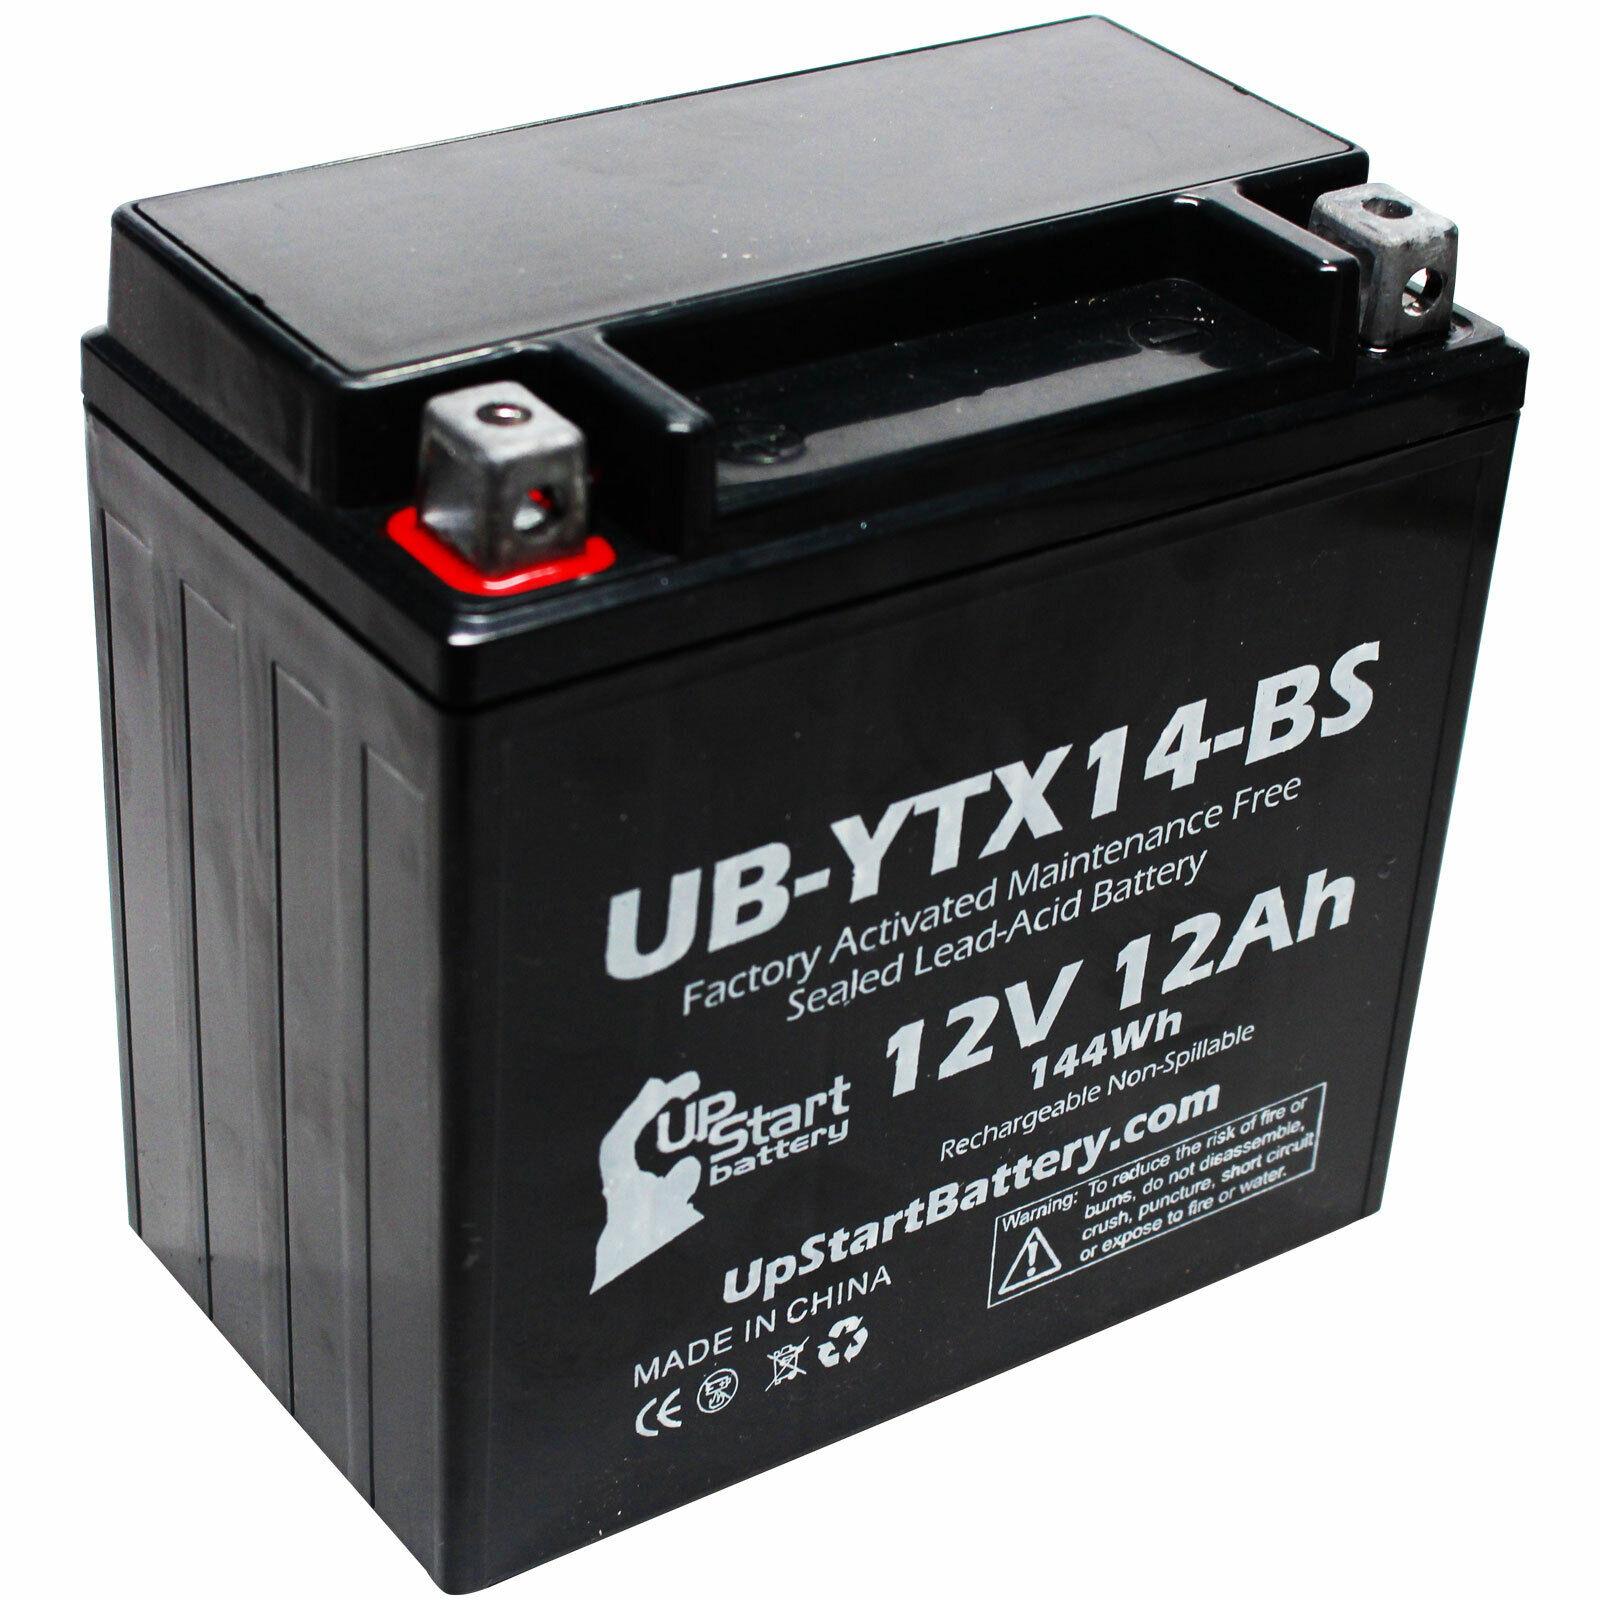 12V 12AH Battery for 1986 Honda TRX350, D FourTrax 4x4 350 CC